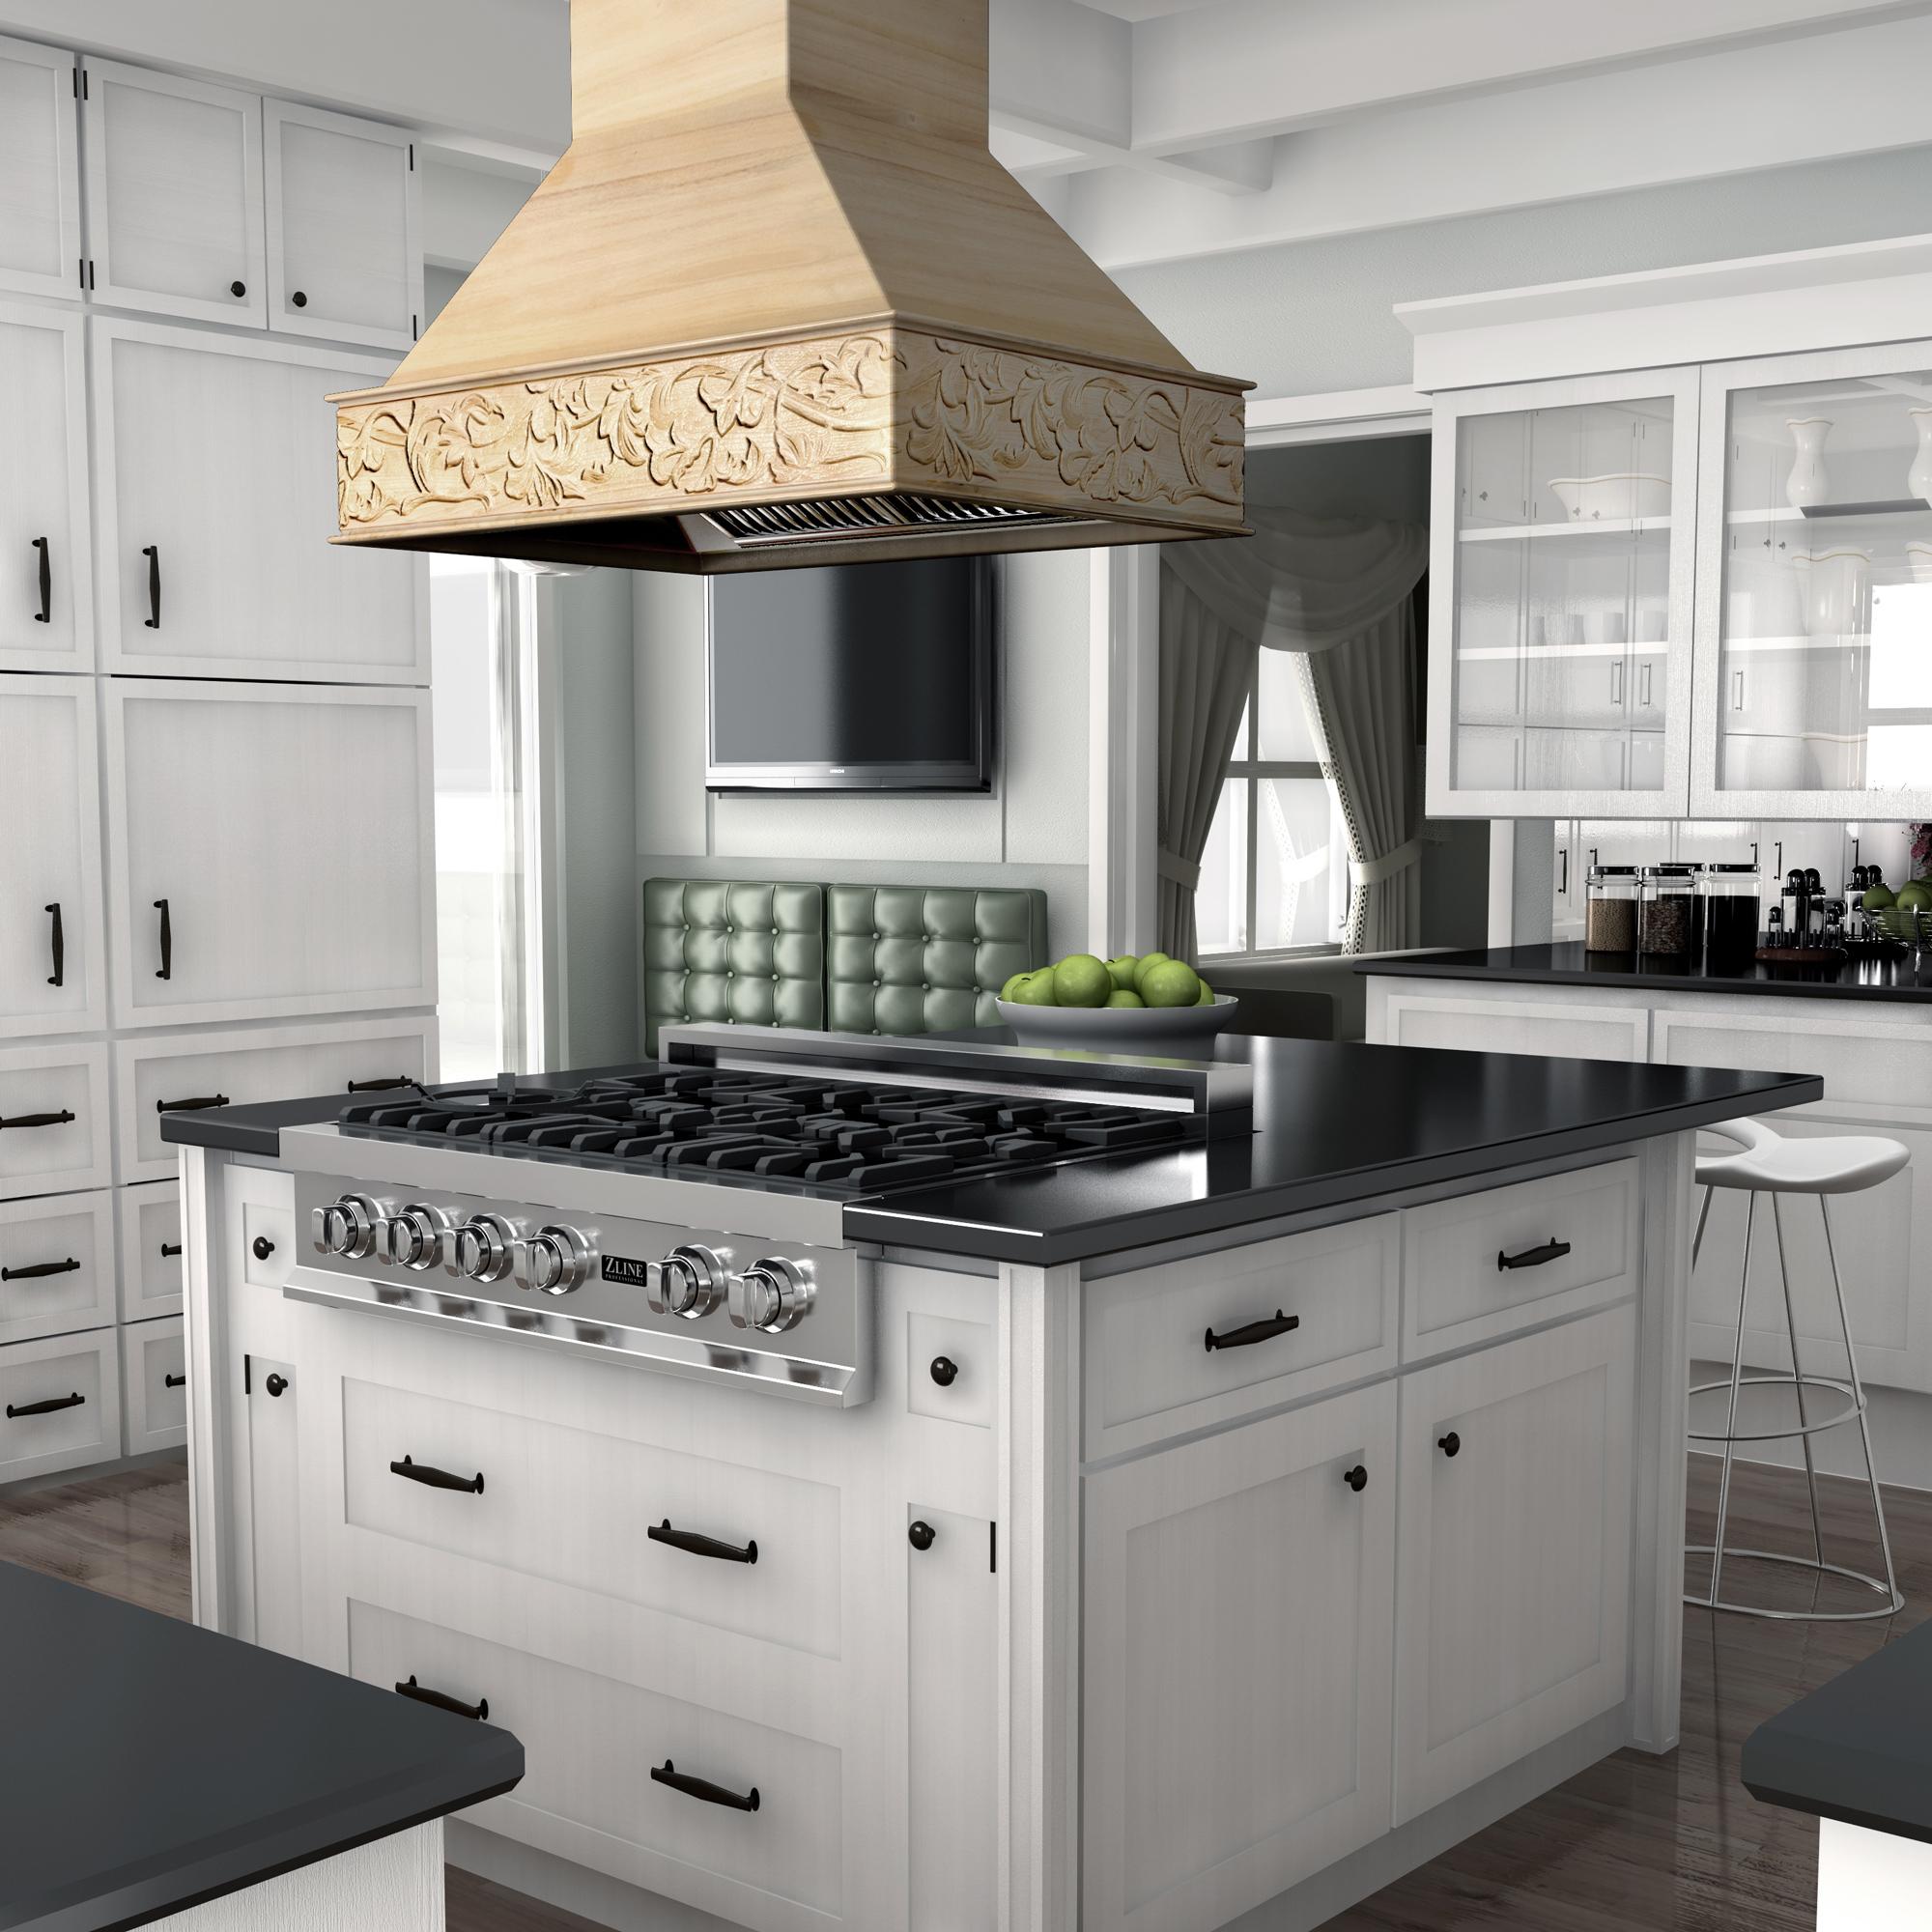 9373_UF_New_kitchen05_Images_Dropin_Cam_01_RE_B.jpg